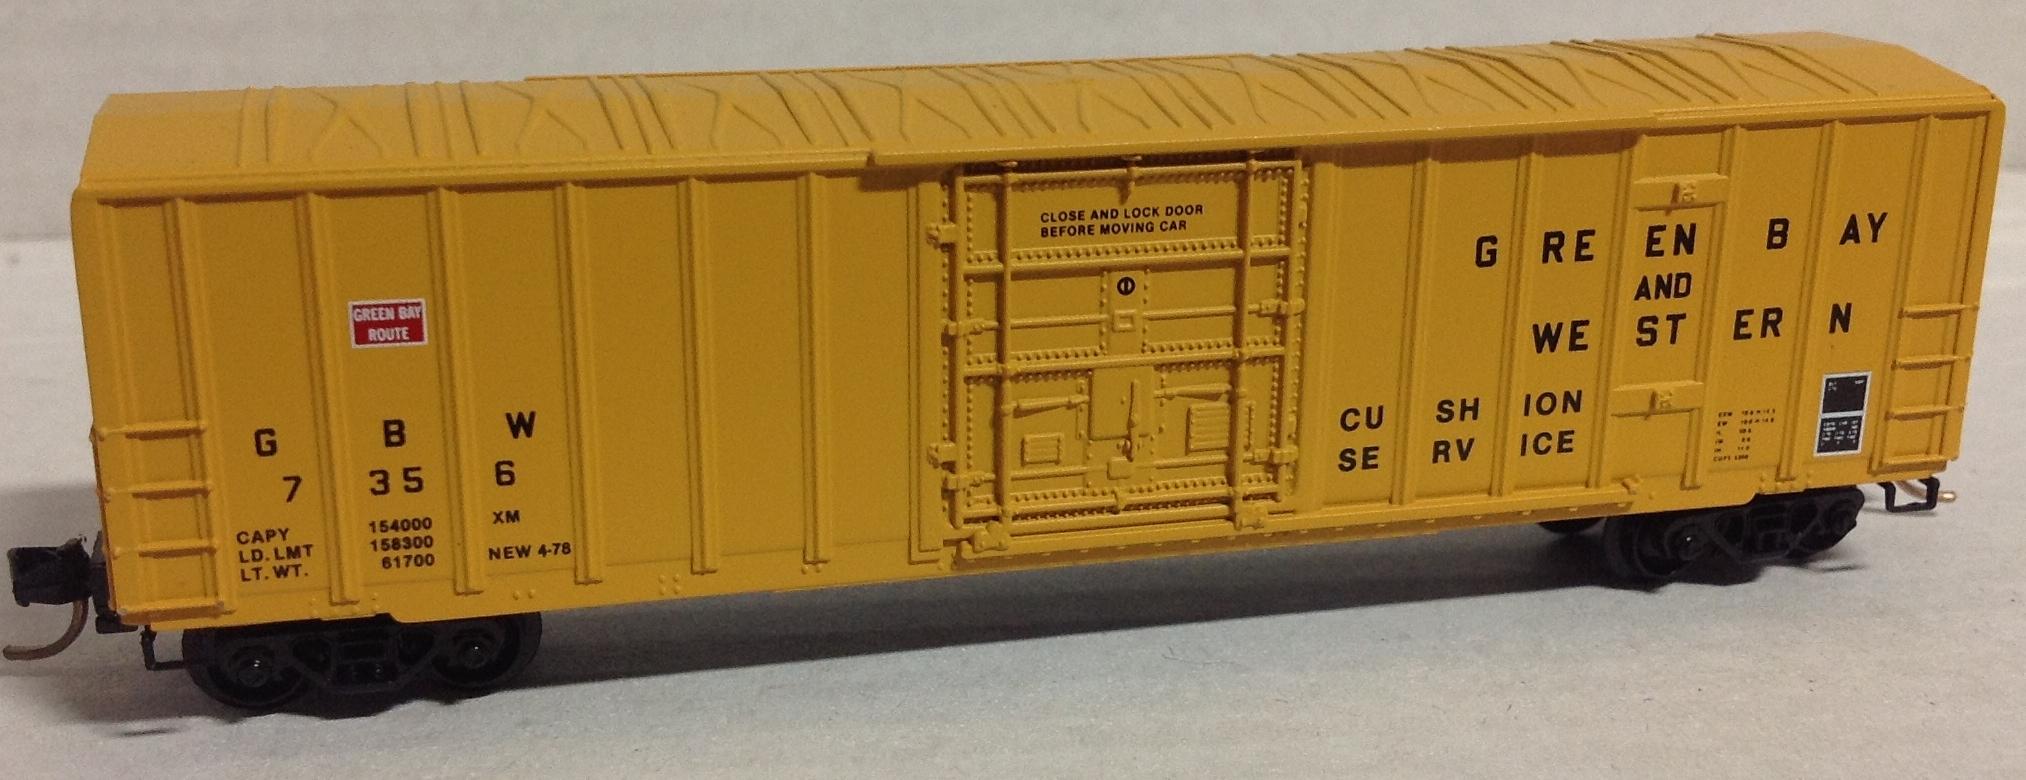 N Scale - Micro-Trains - 27080 - Boxcar, 50 Foot, Steel - Green Bay & Western - 7356